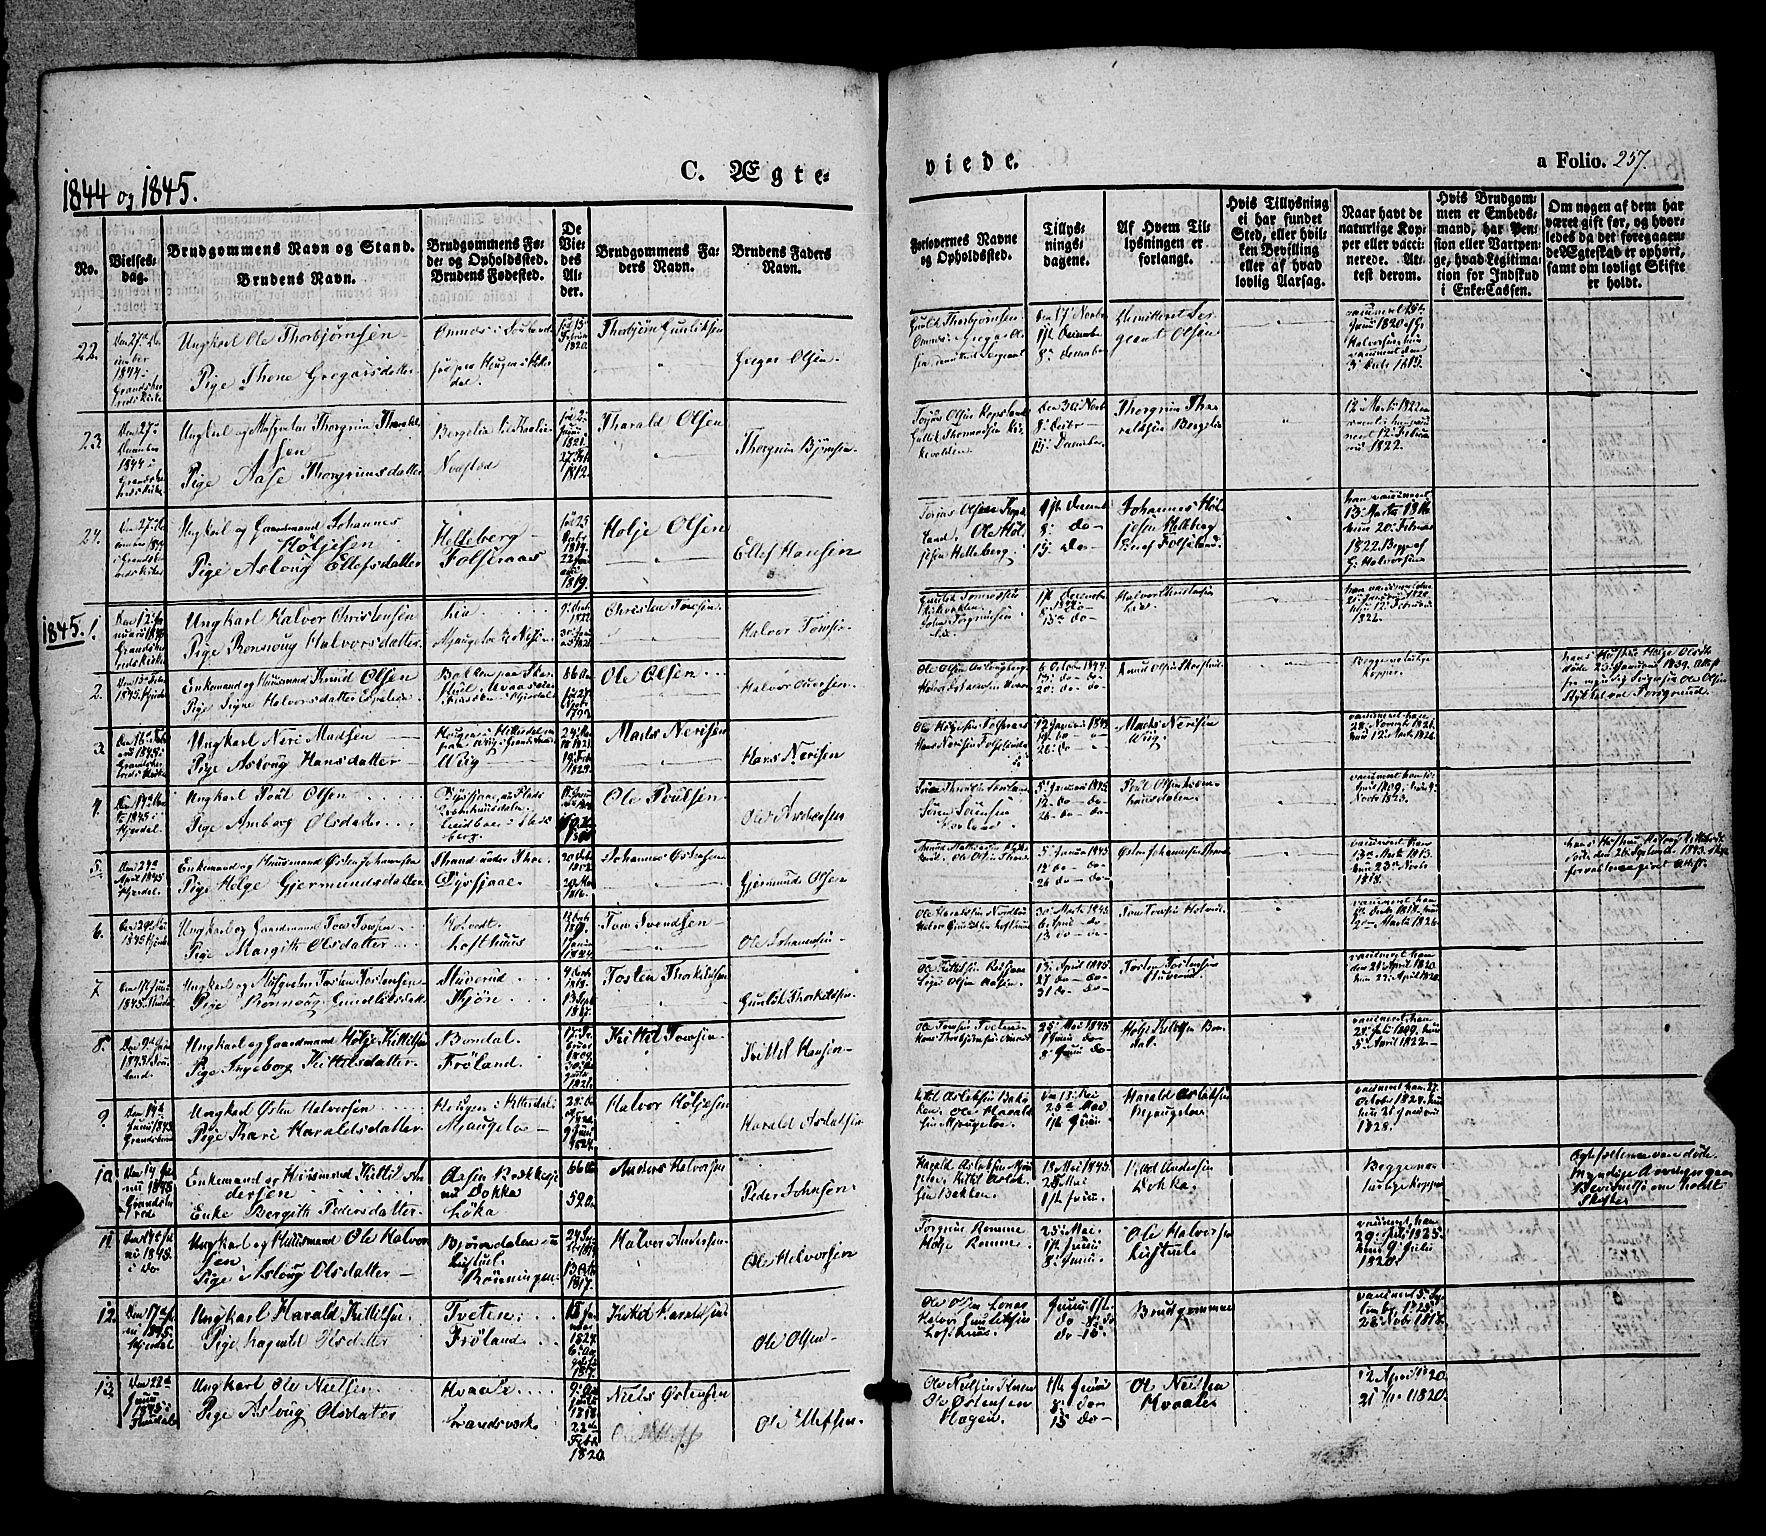 SAKO, Hjartdal kirkebøker, F/Fa/L0008: Ministerialbok nr. I 8, 1844-1859, s. 257